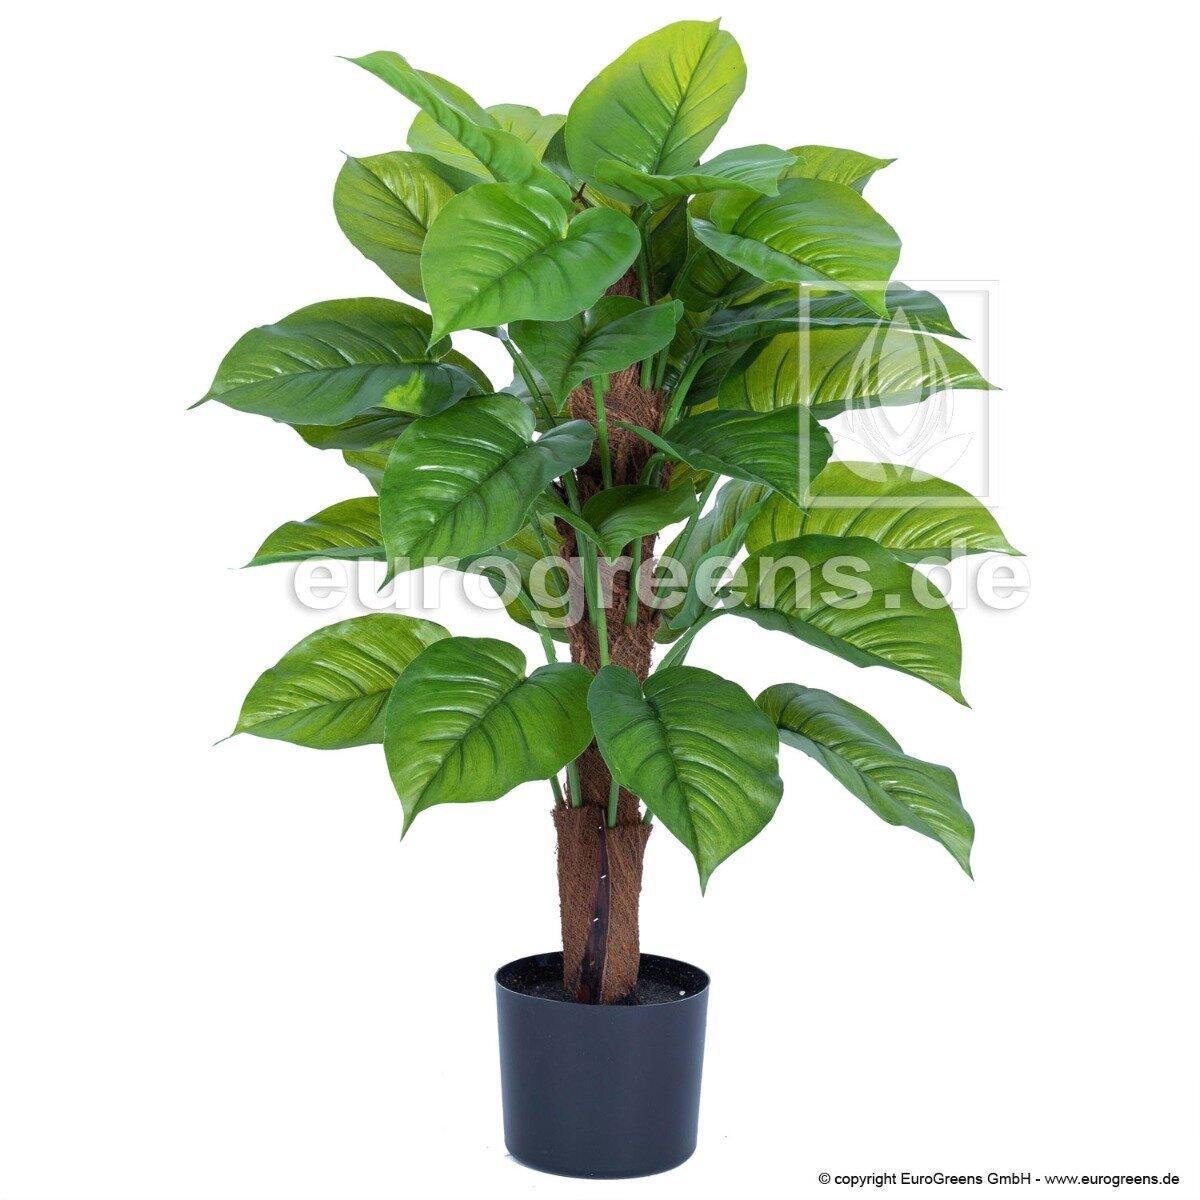 Umelá rastlina Filodendron 85 cm